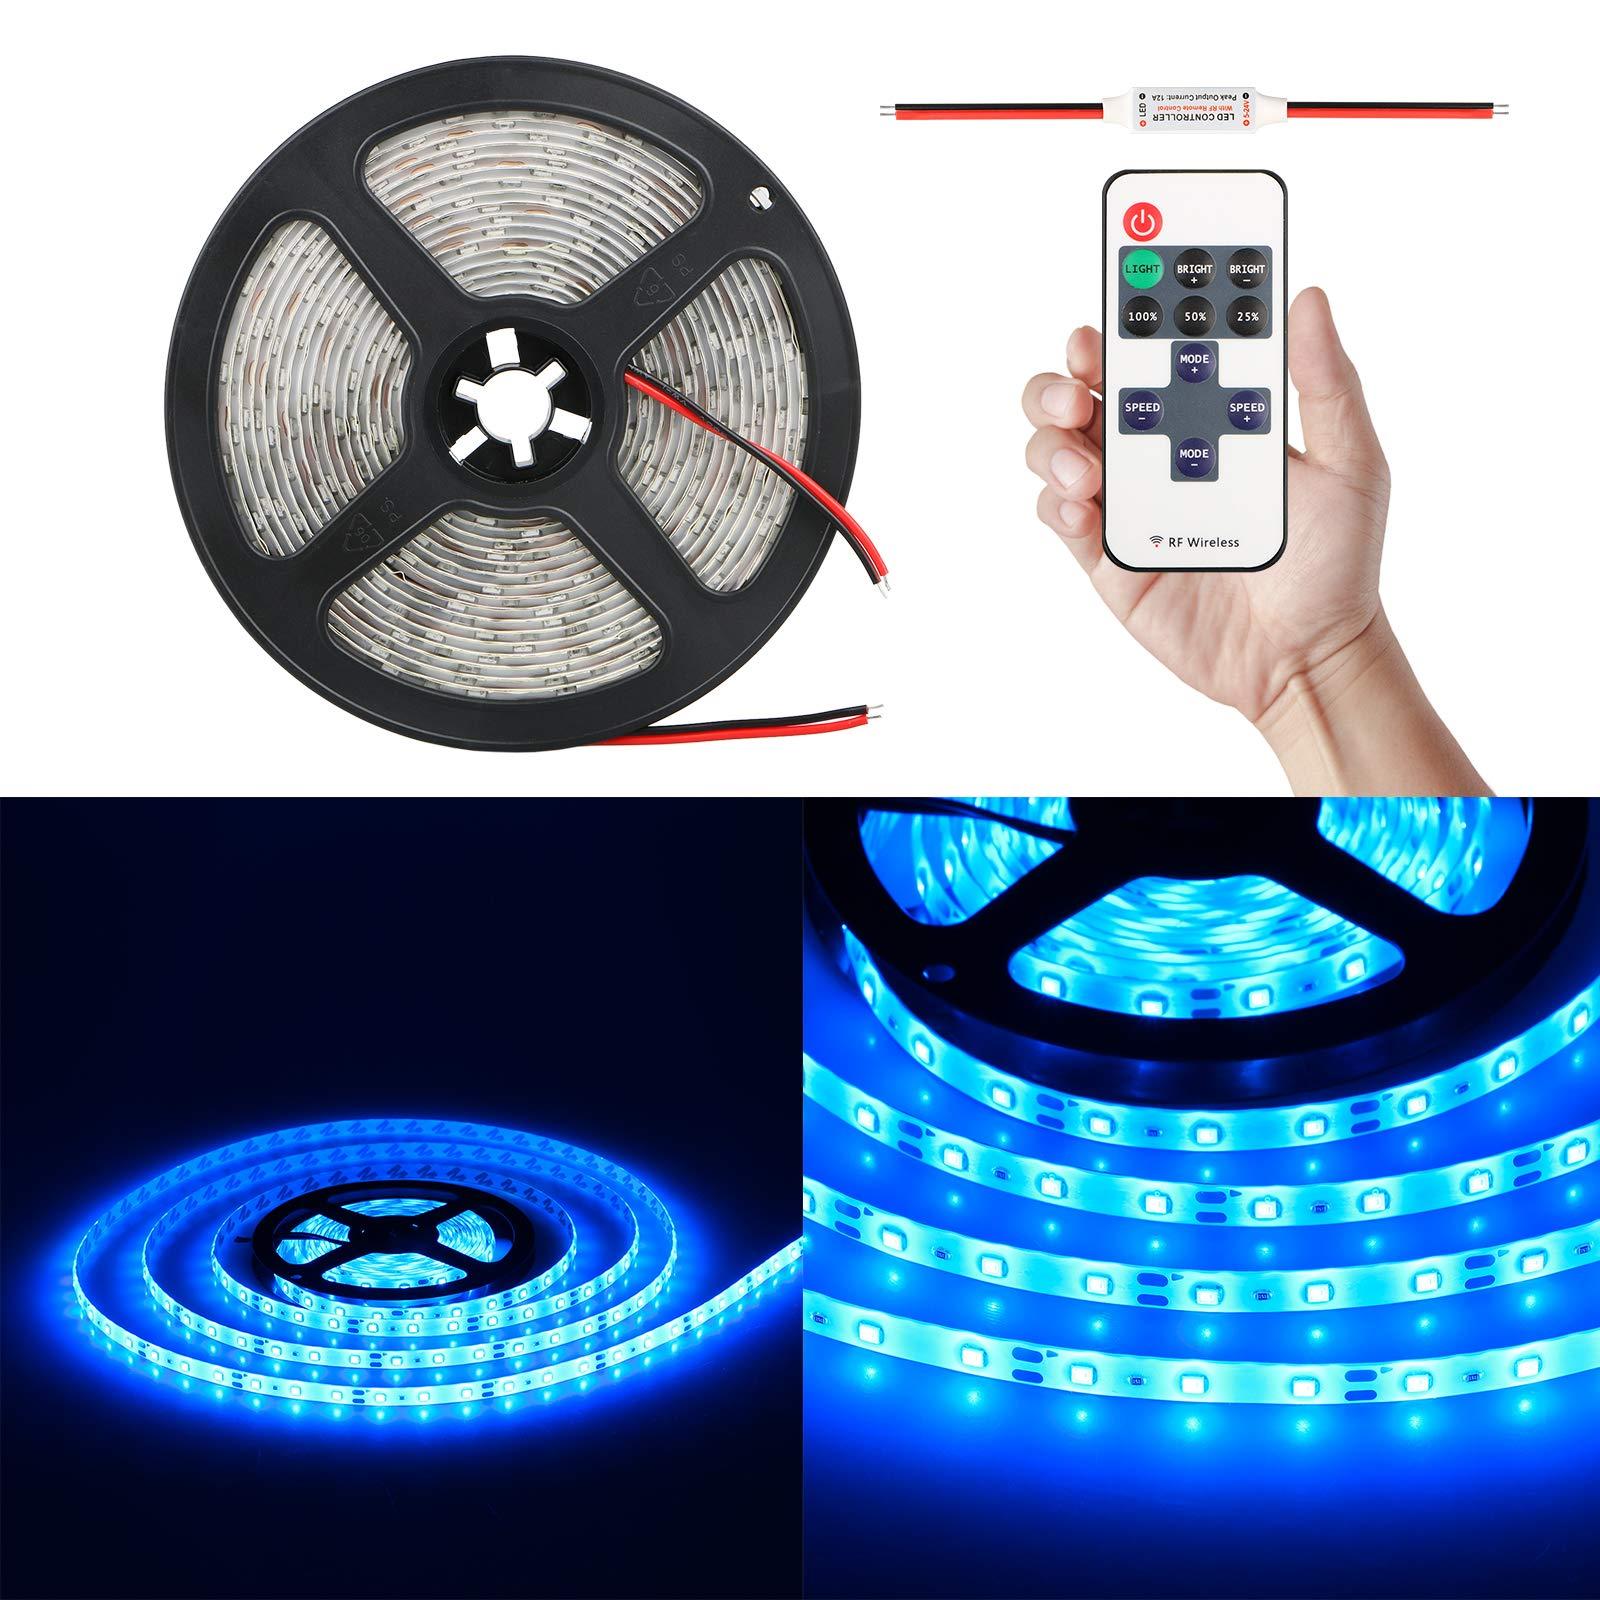 EEEKit Wireless Blue LED Light Strip Kit, Premium High Density SMD3528-16.4 Feet, 300 LEDs, 164 Lumens per Foot. UL-Listed. 12V DC Tape Flexible Interior Light